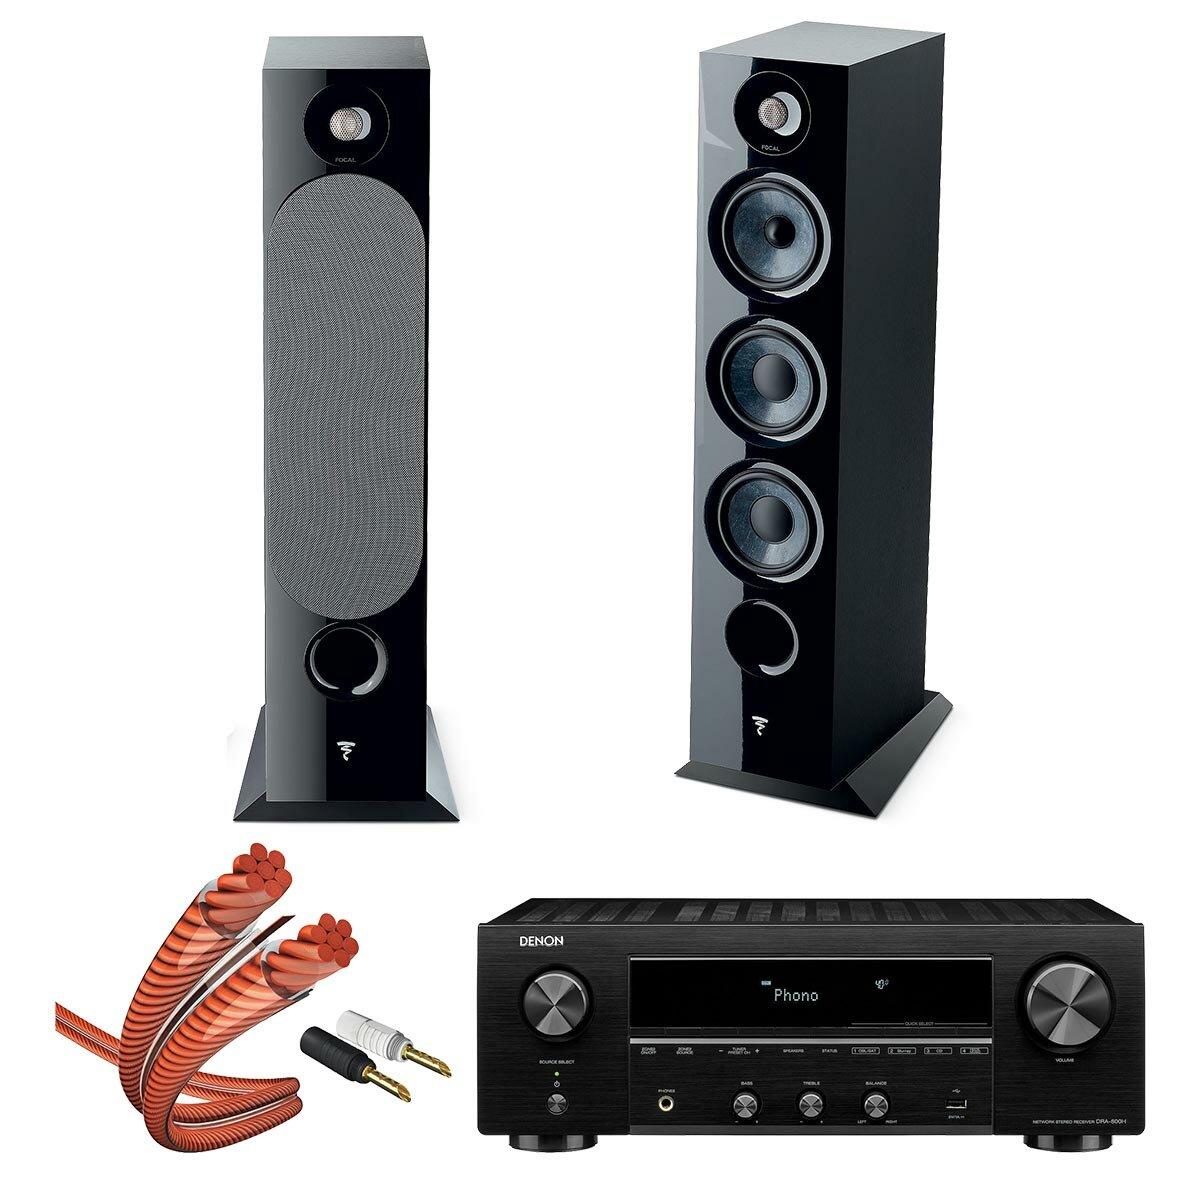 Комплекты с напольной акустикой Focal Chora 826 black + Denon DRA 800H Black + In-Akustik 00604S033, 2.5м